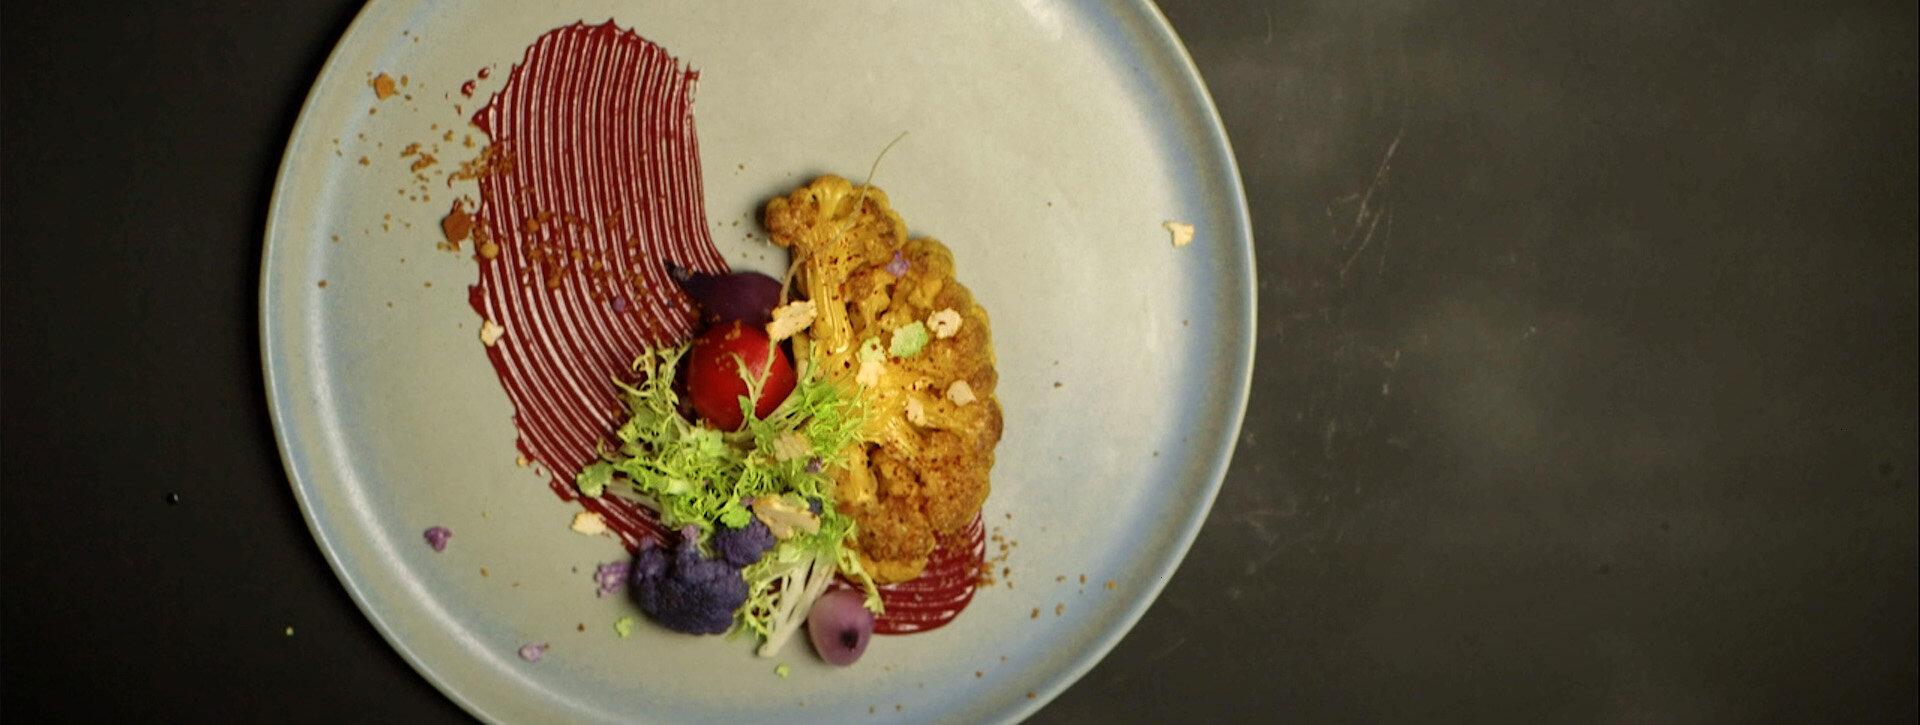 The art of plating | starring chef @pauliecooks